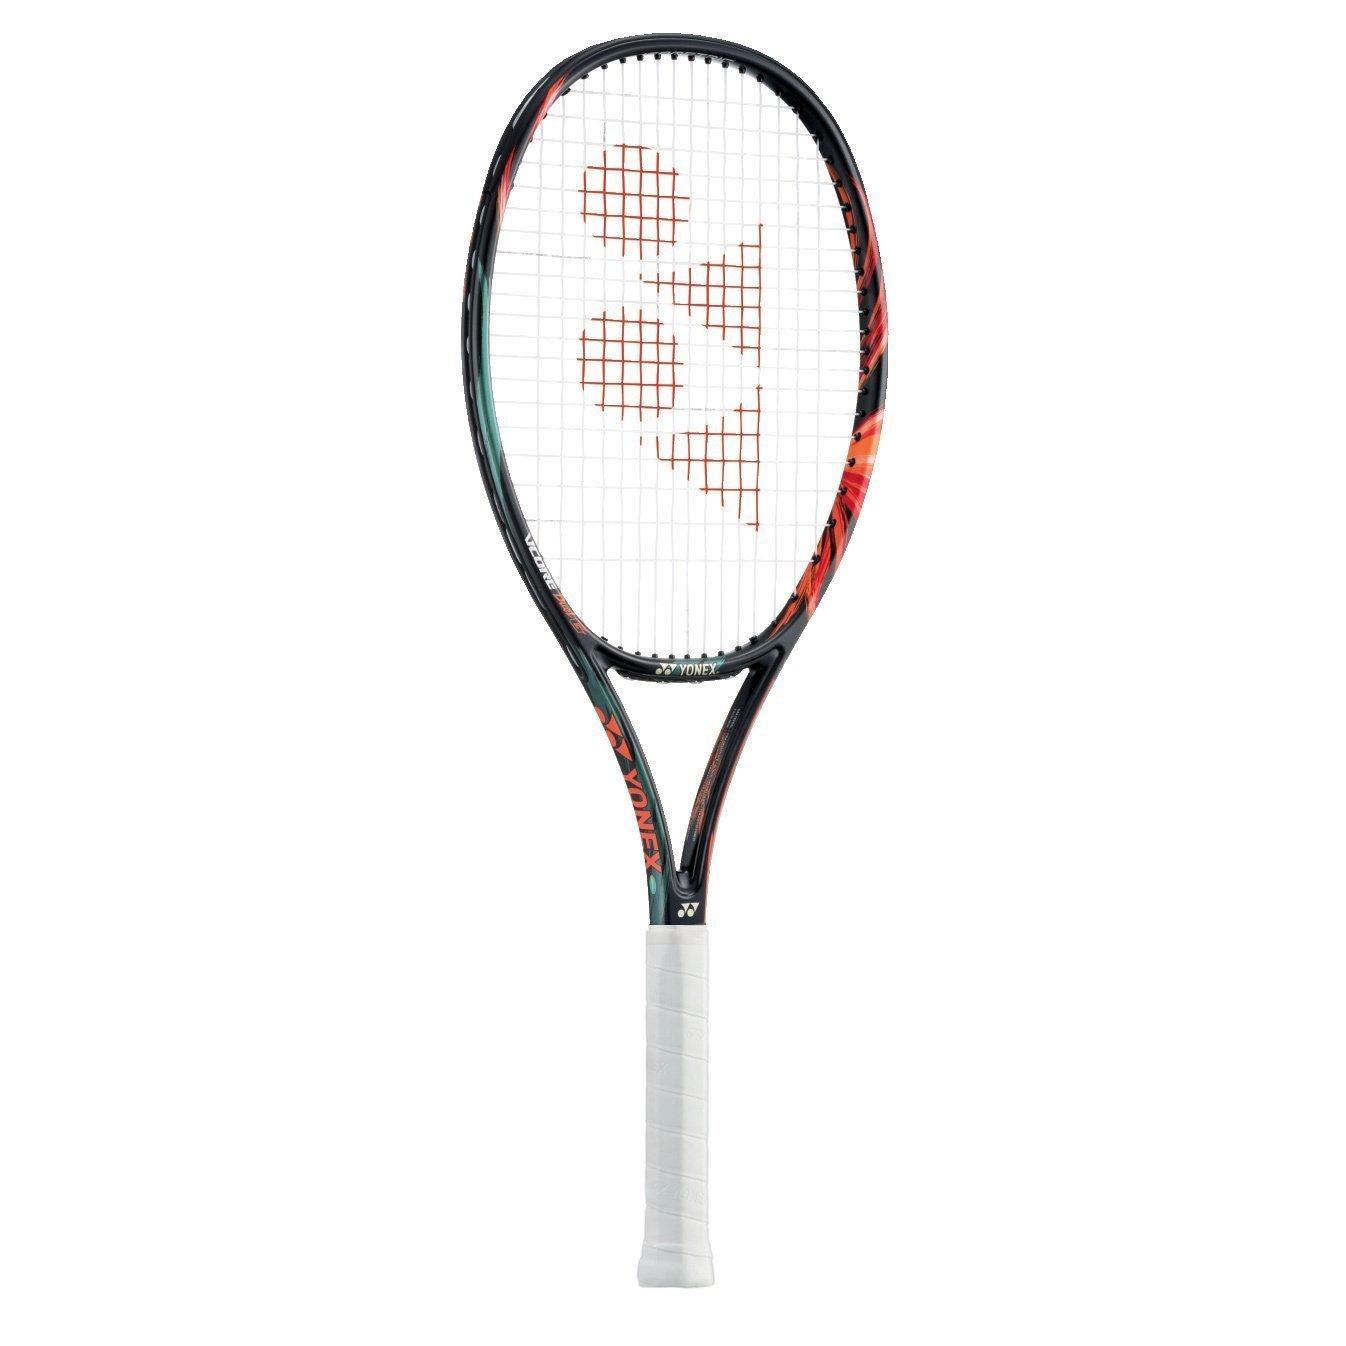 Yonex VCORE Duel G 100 LG Tennis Racket